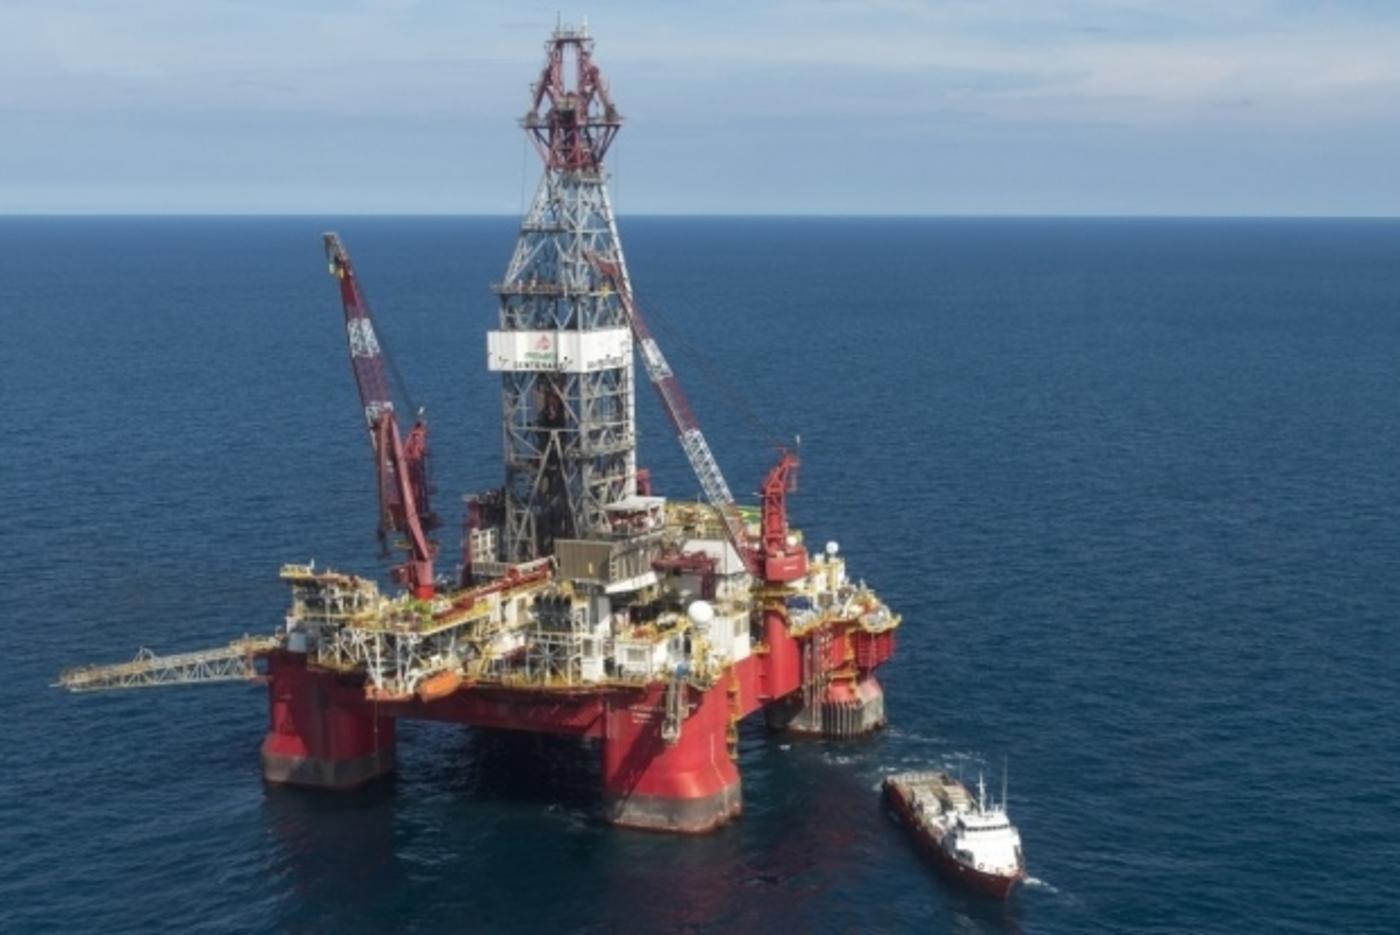 Italian company discovers massive gas find off Egyptian